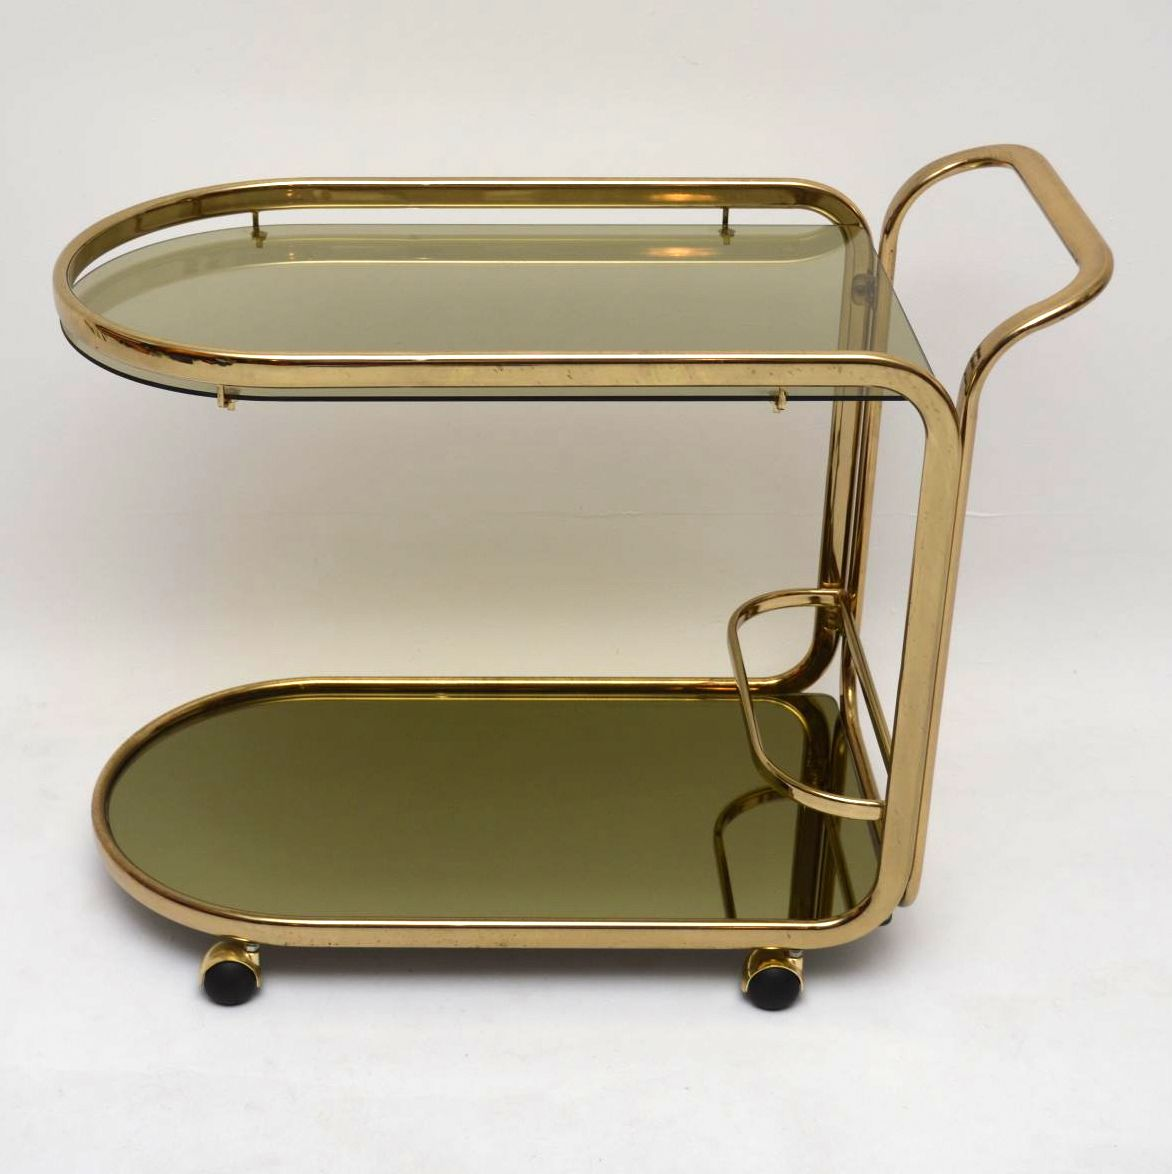 Retro Brass Drinks Trolley Vintage 1970's